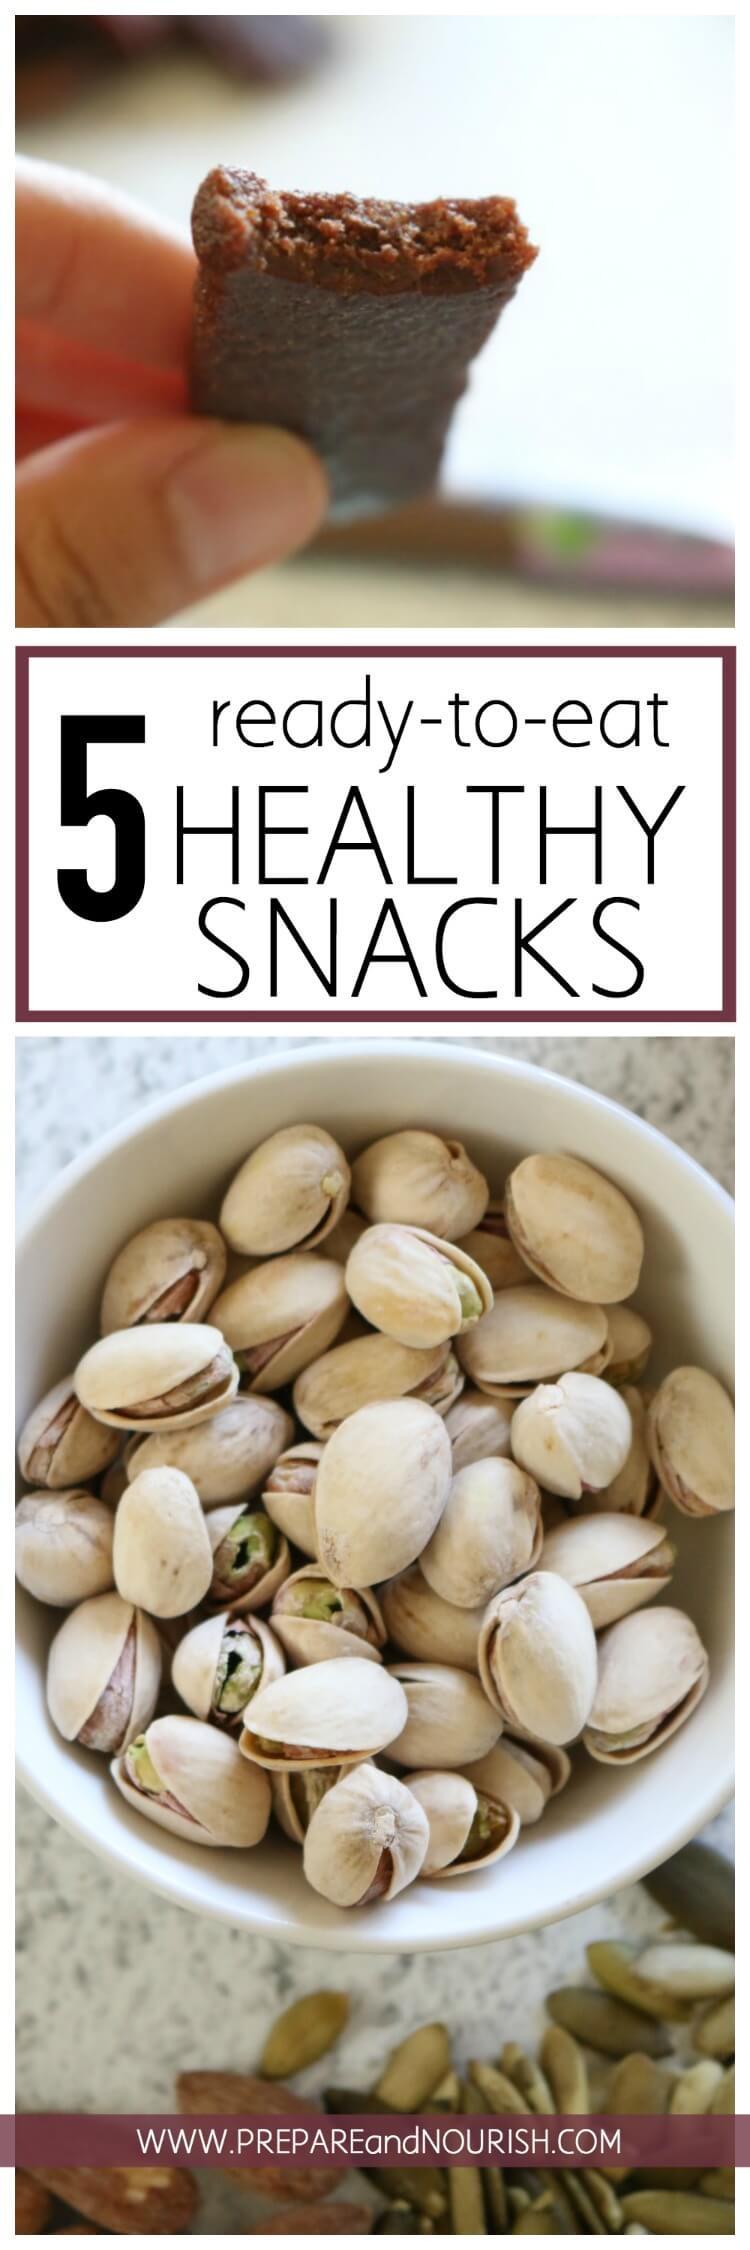 Healthy Ready To Eat Snacks  Five Paleo Ready to Eat Healthy Snacks Prepare & Nourish